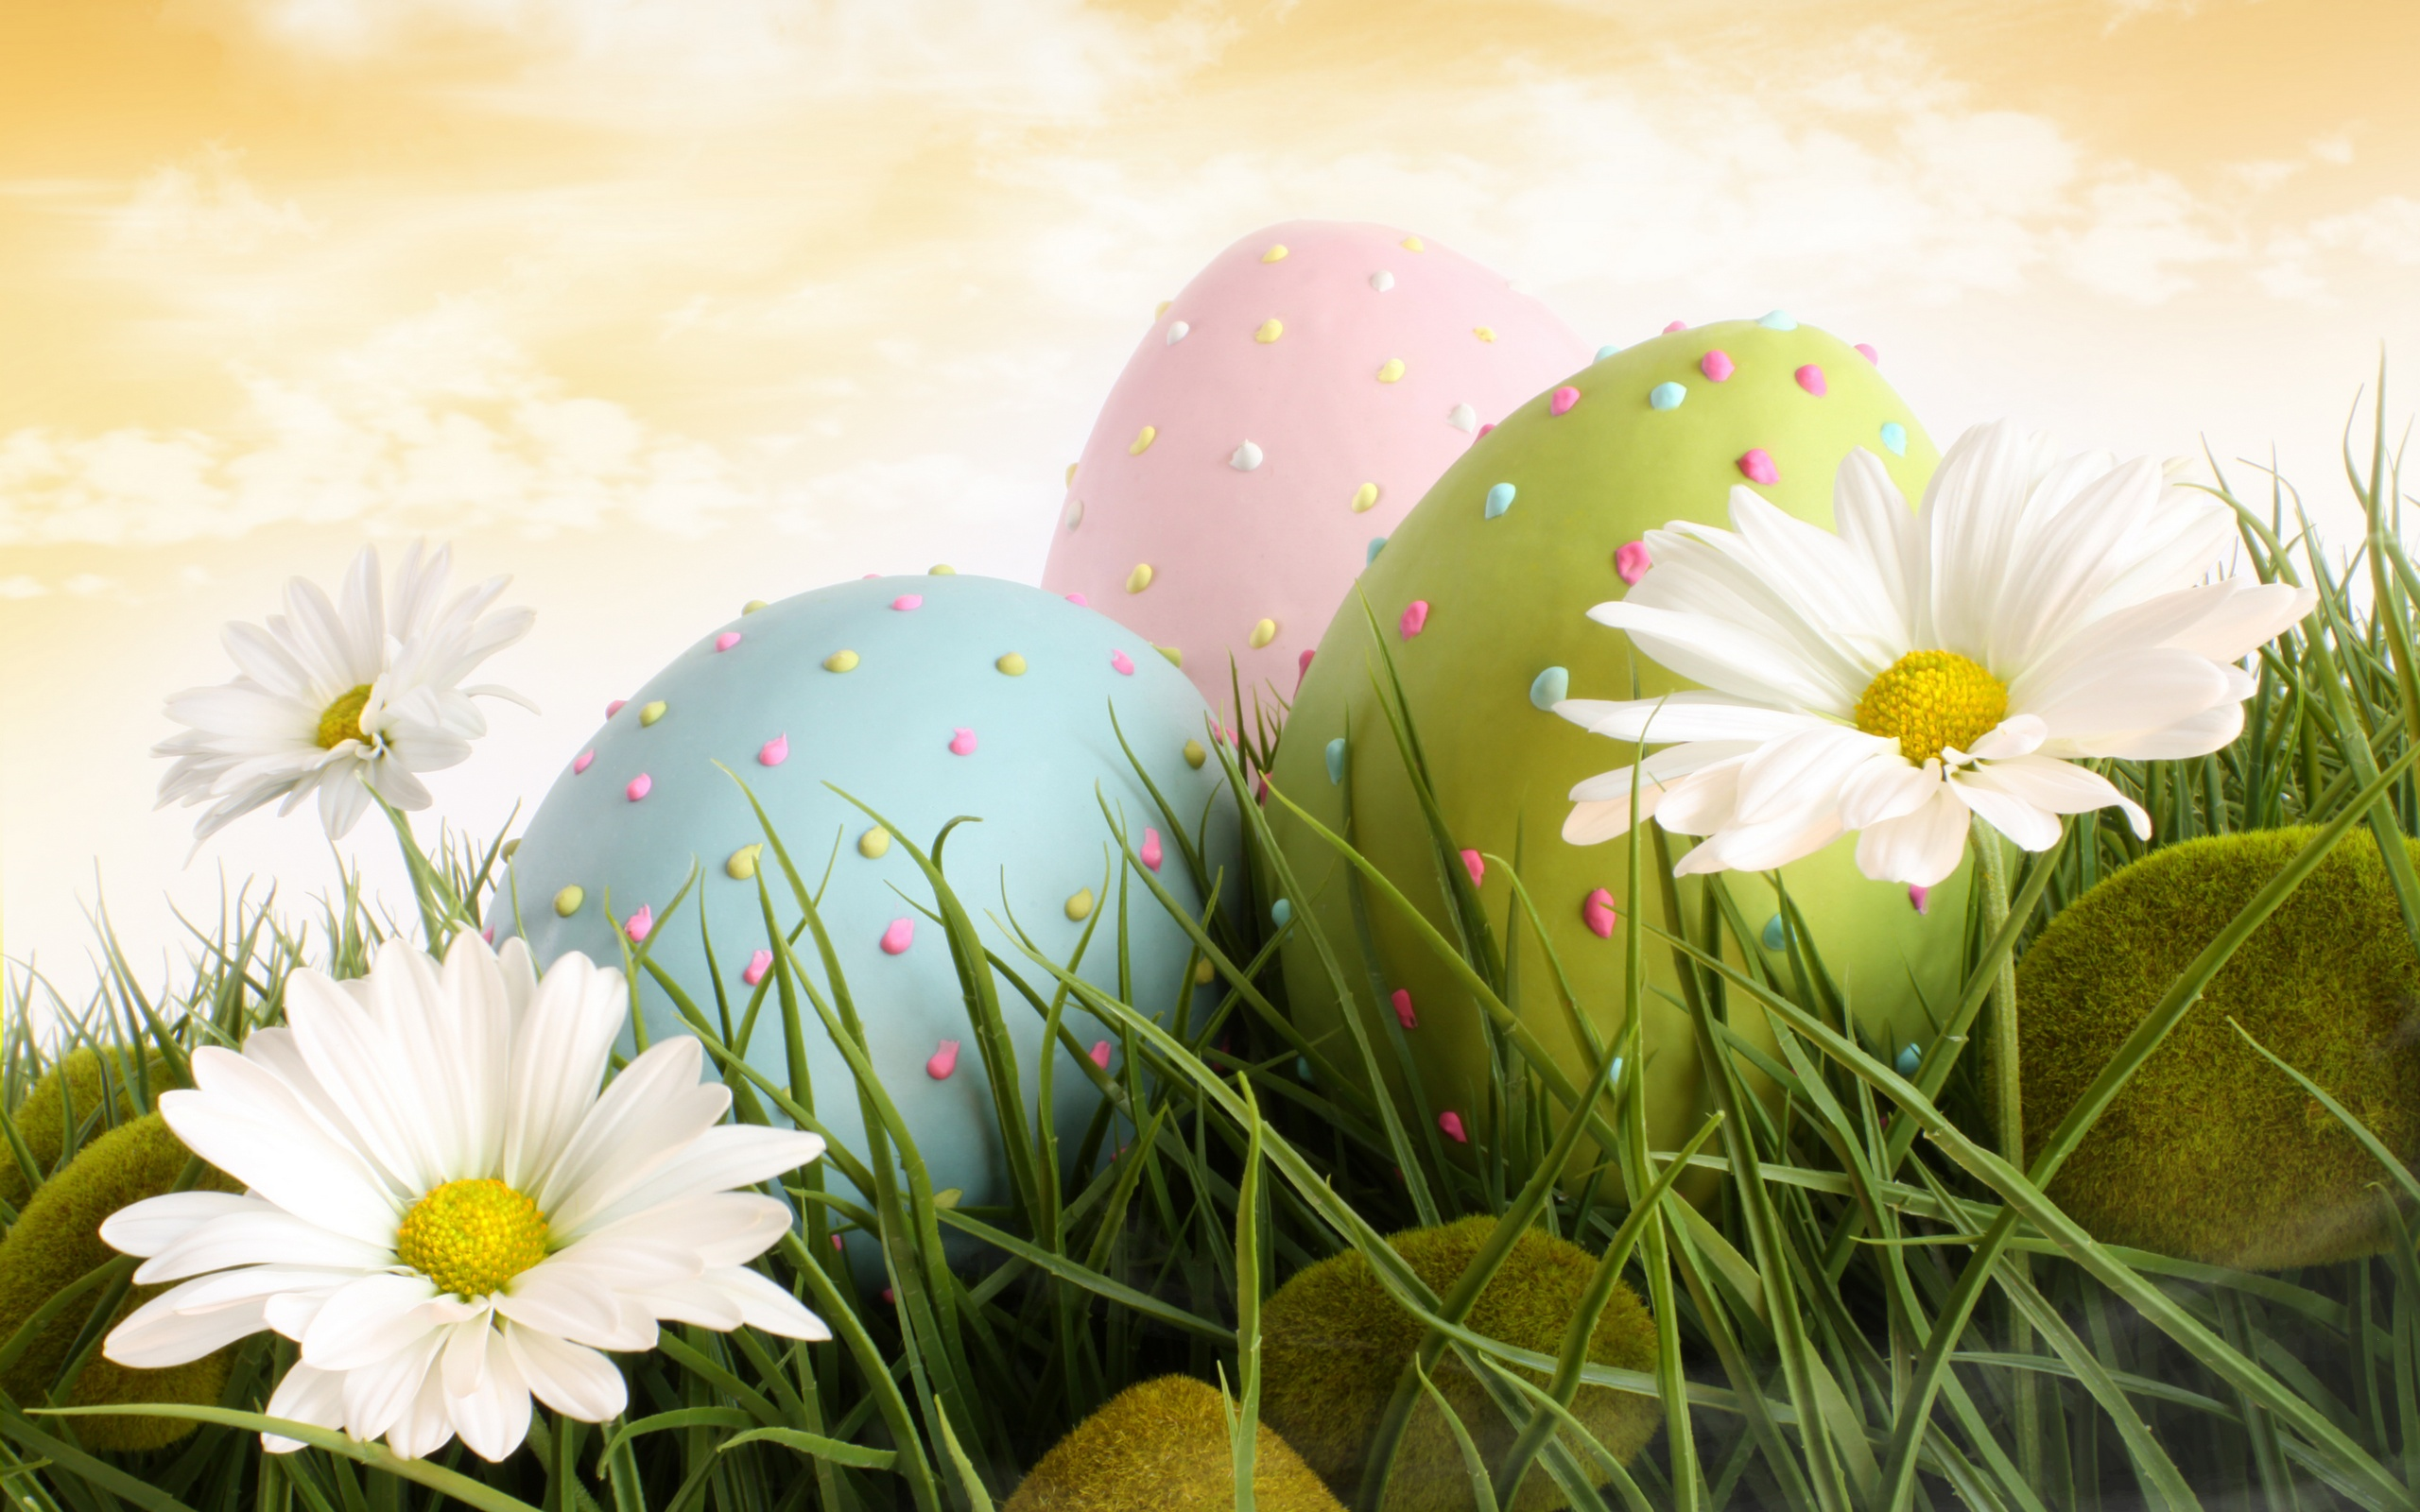 HD Bunnies And Easter Wallpapers Desktop Backgrounds Funmole 2560x1600